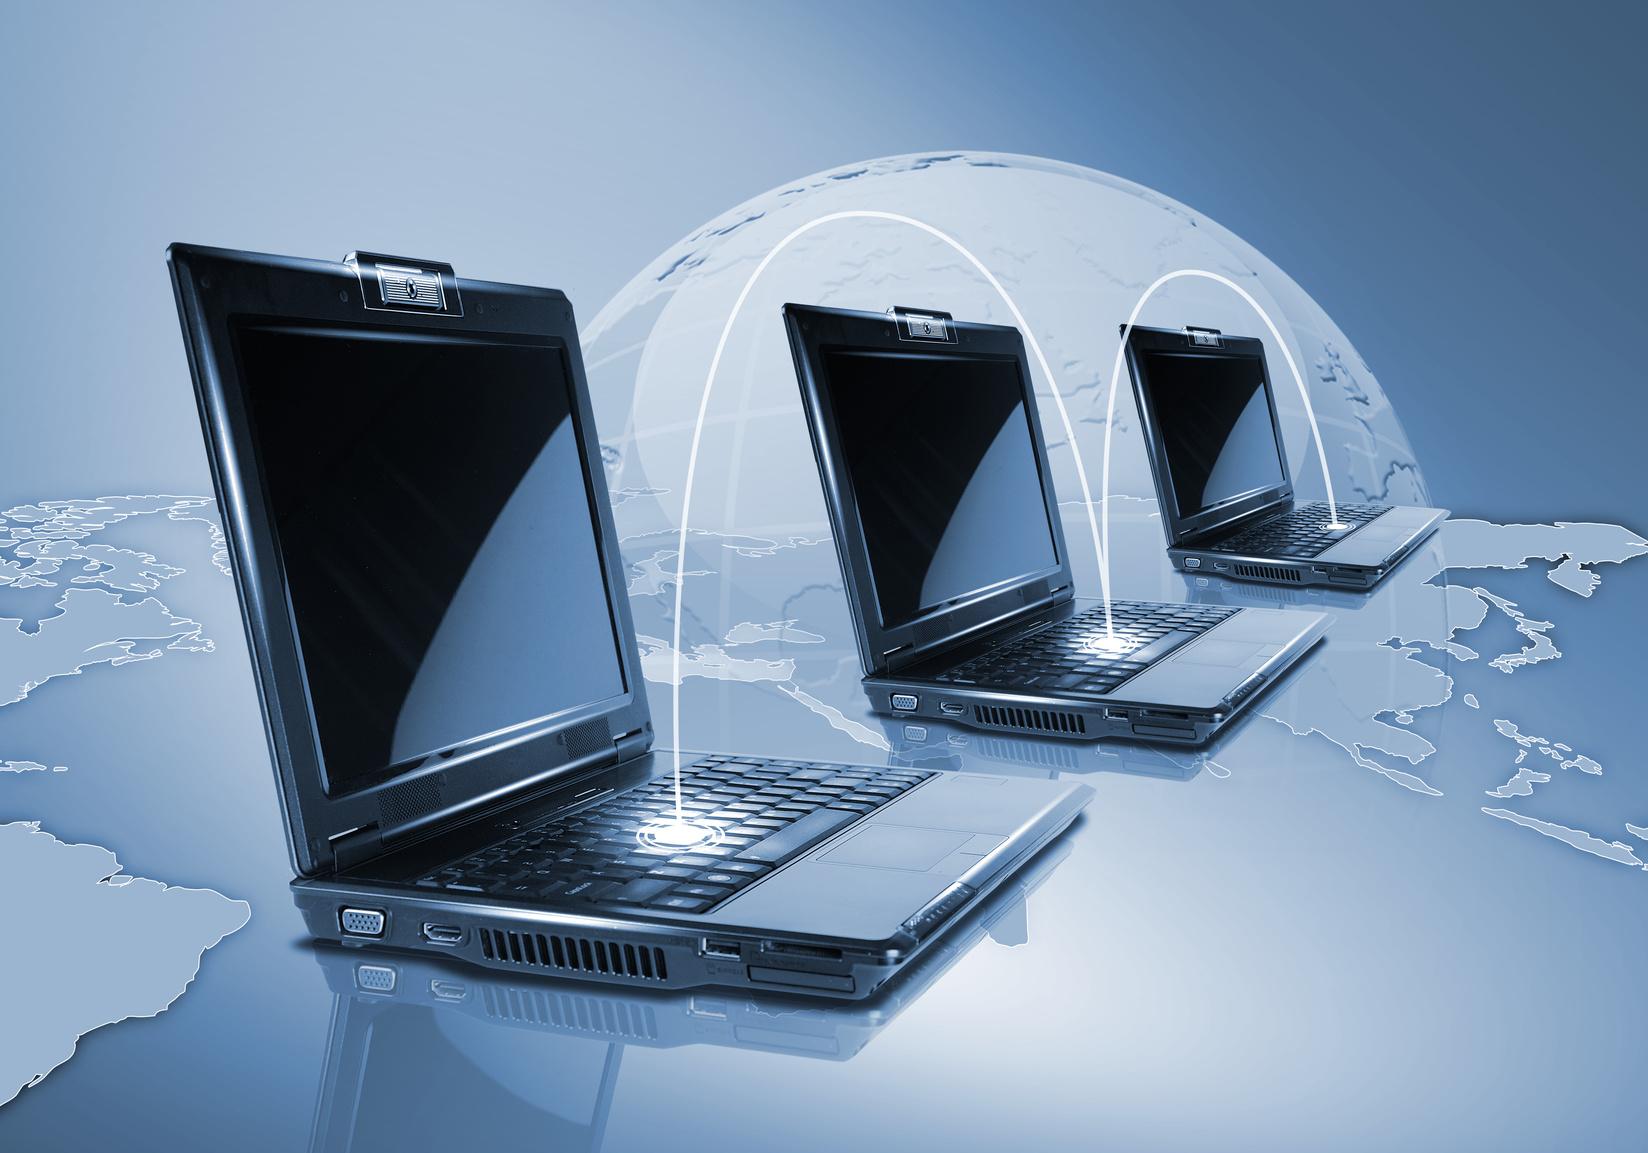 Webhosting: Welcher Anbieter passt am Besten?